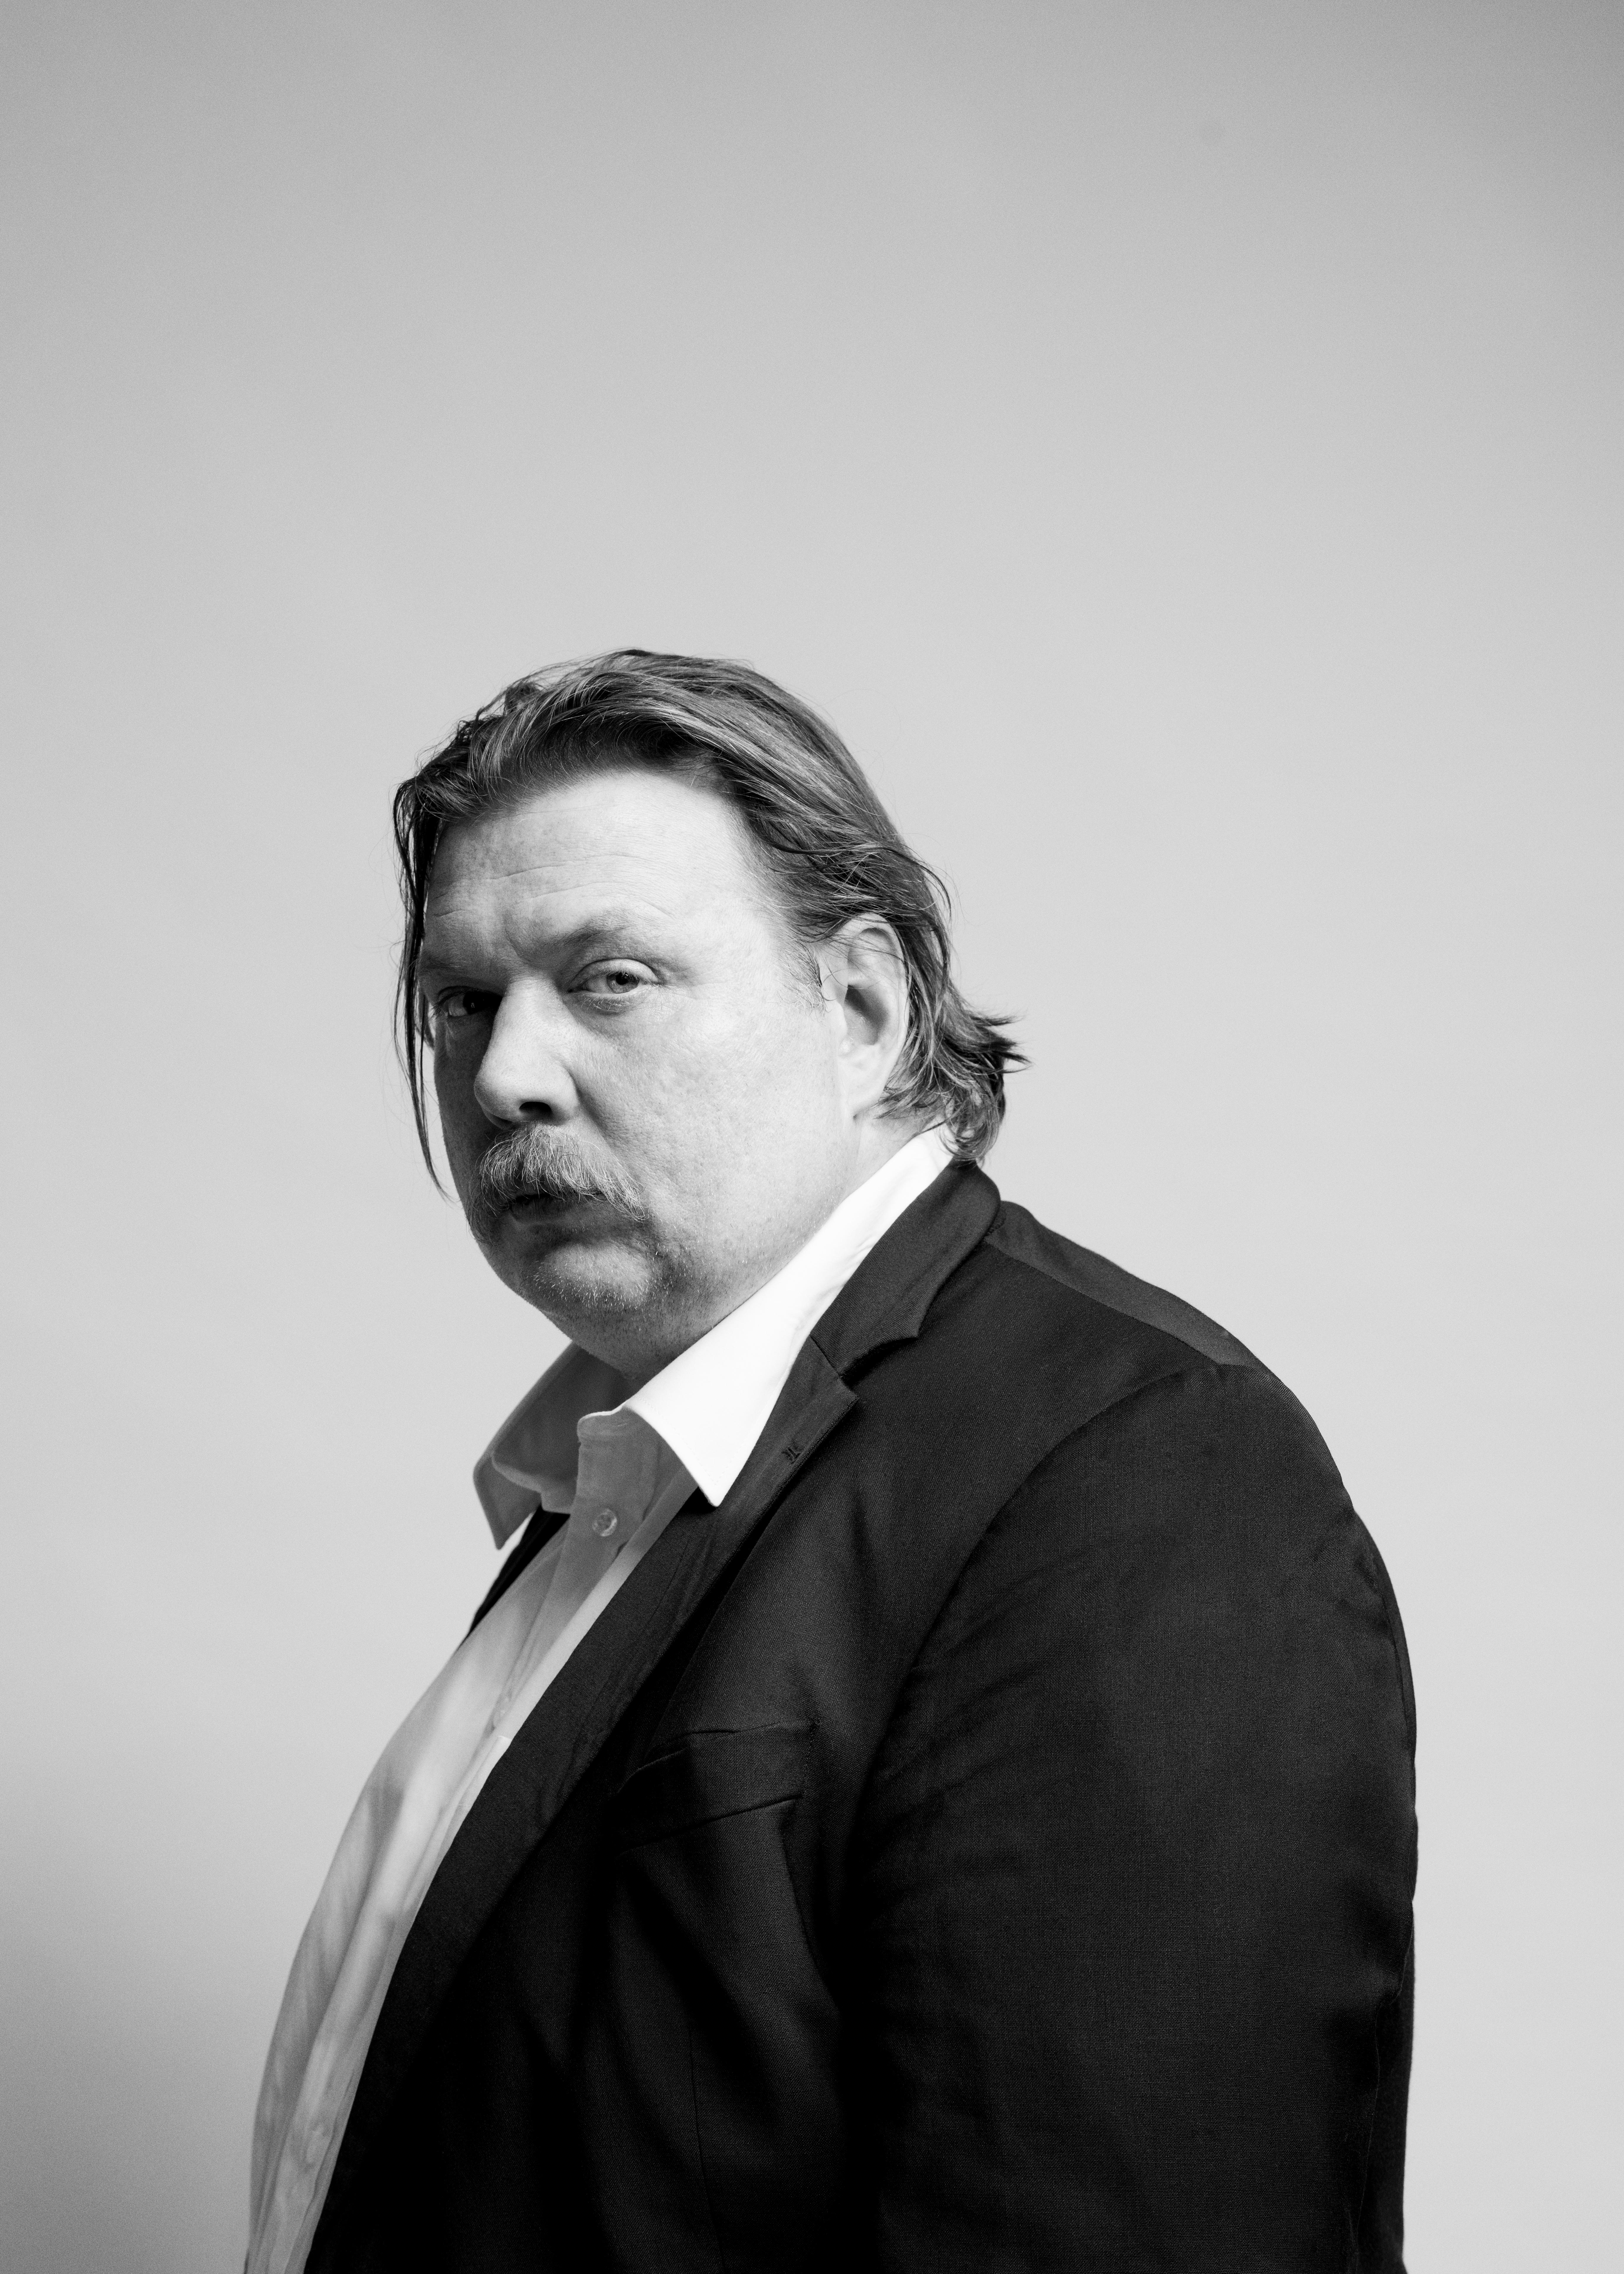 FOTOGRAF ROBIN SKJOLDBORG